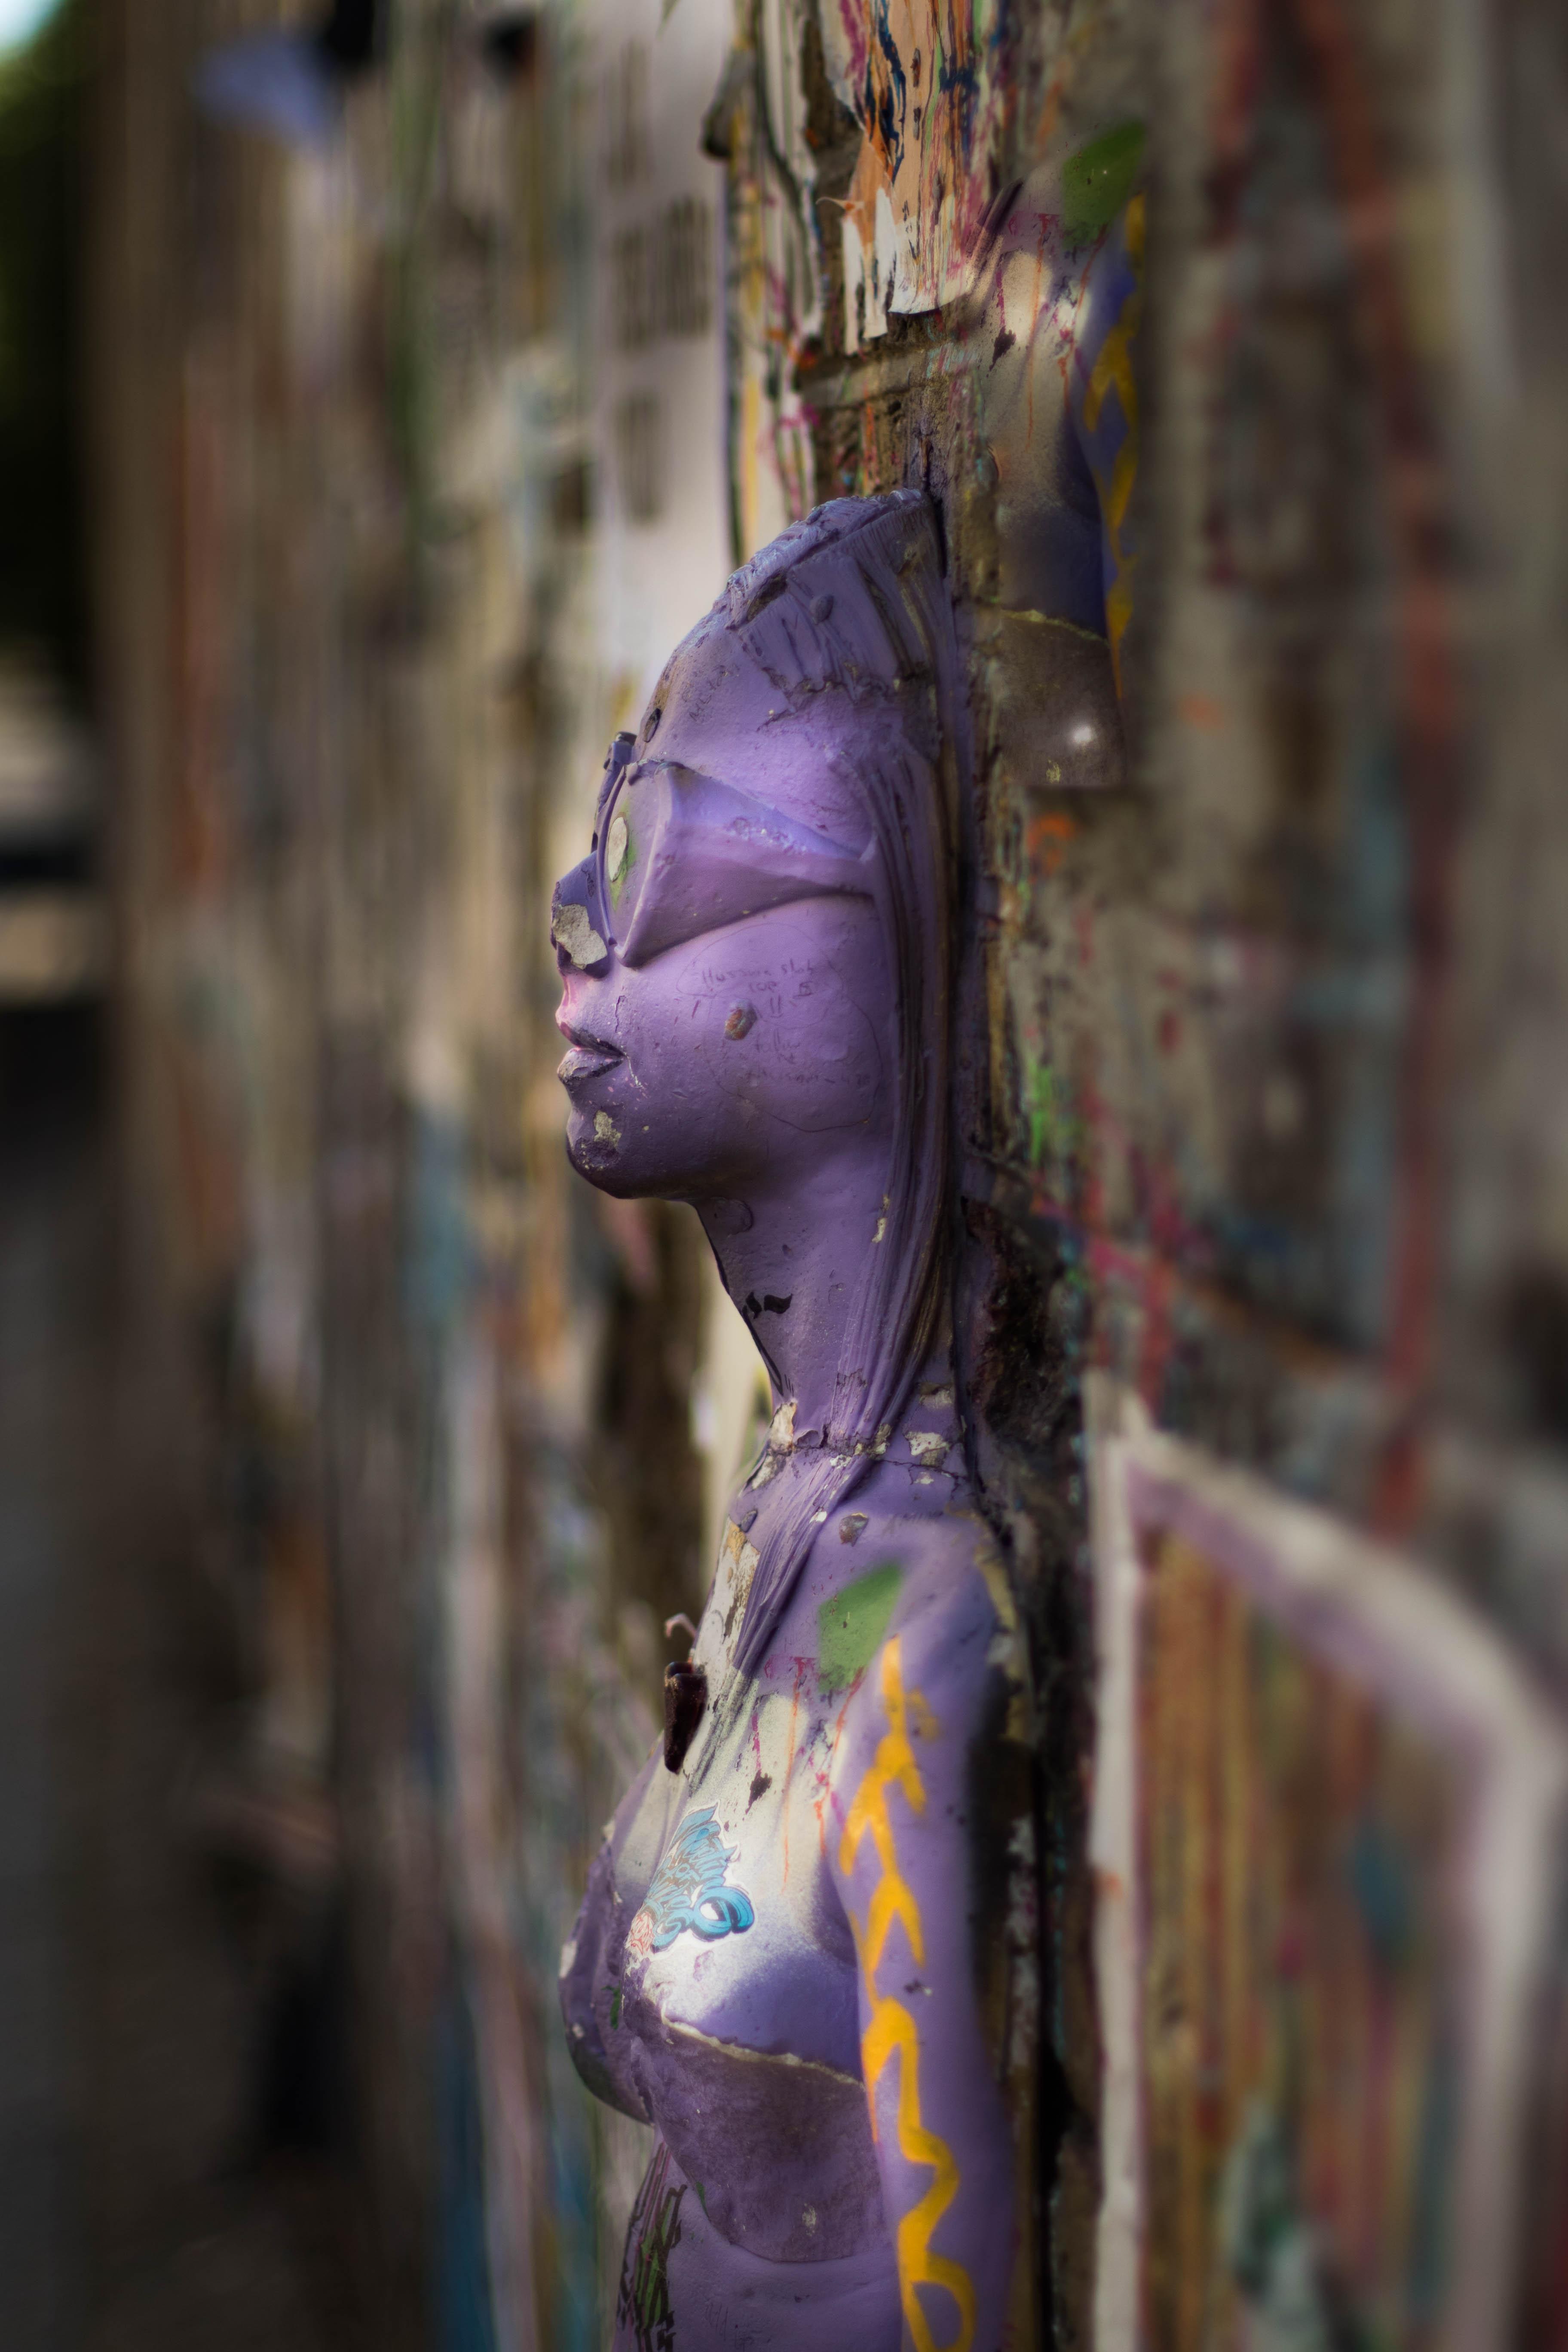 Purple relief figure in Brick lane, London